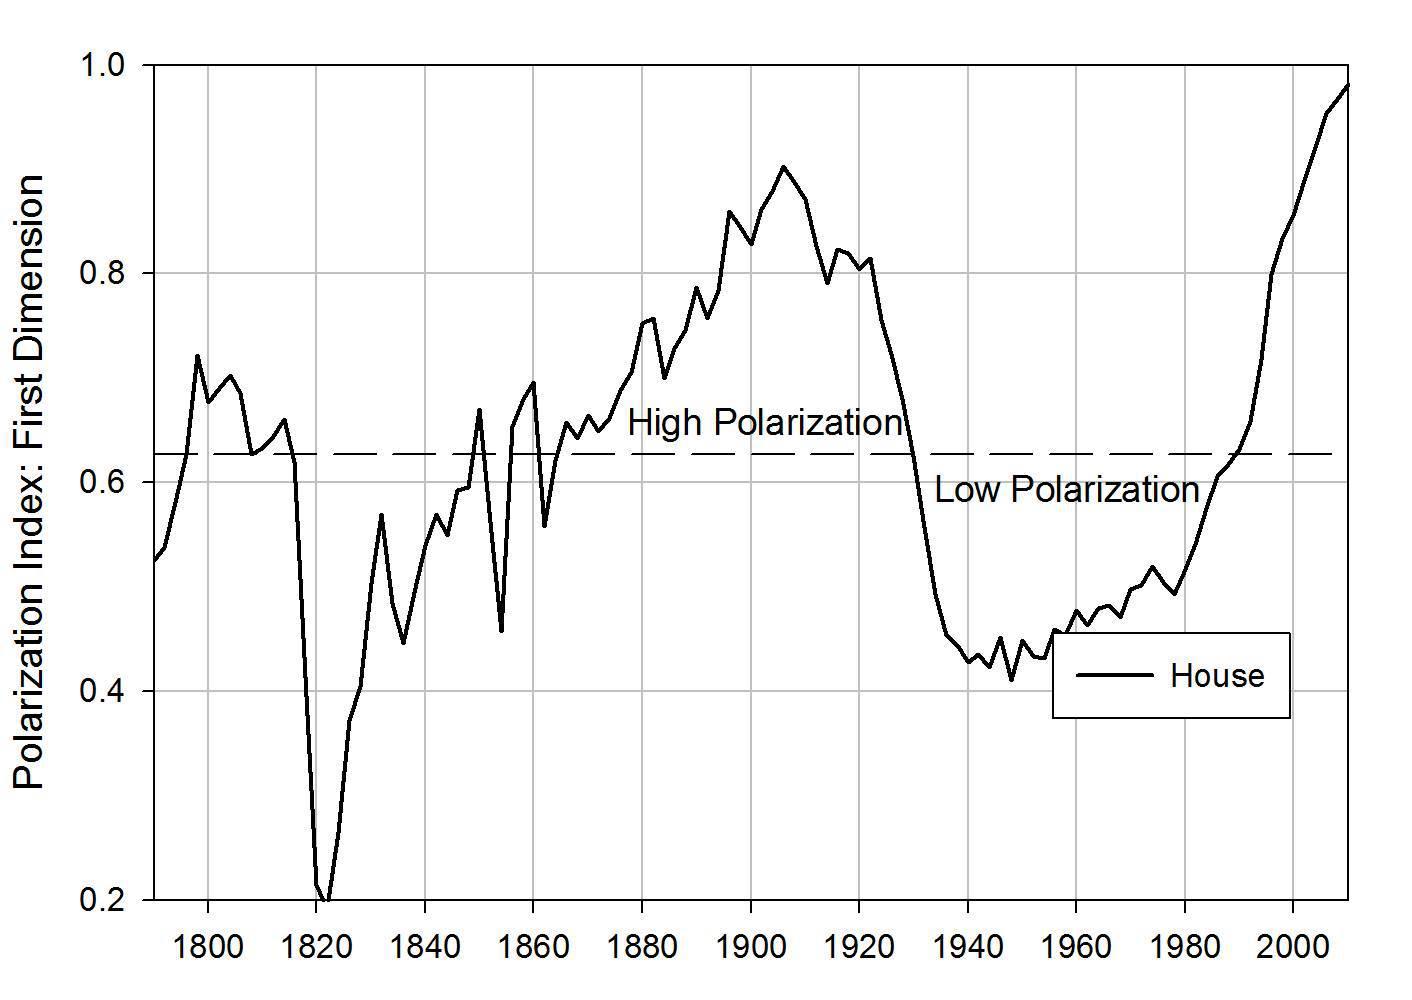 polarization, οι κορυφώσεις και τα βυθίσματα της κοινωνίας, κατάρρευση της κοινωνίας